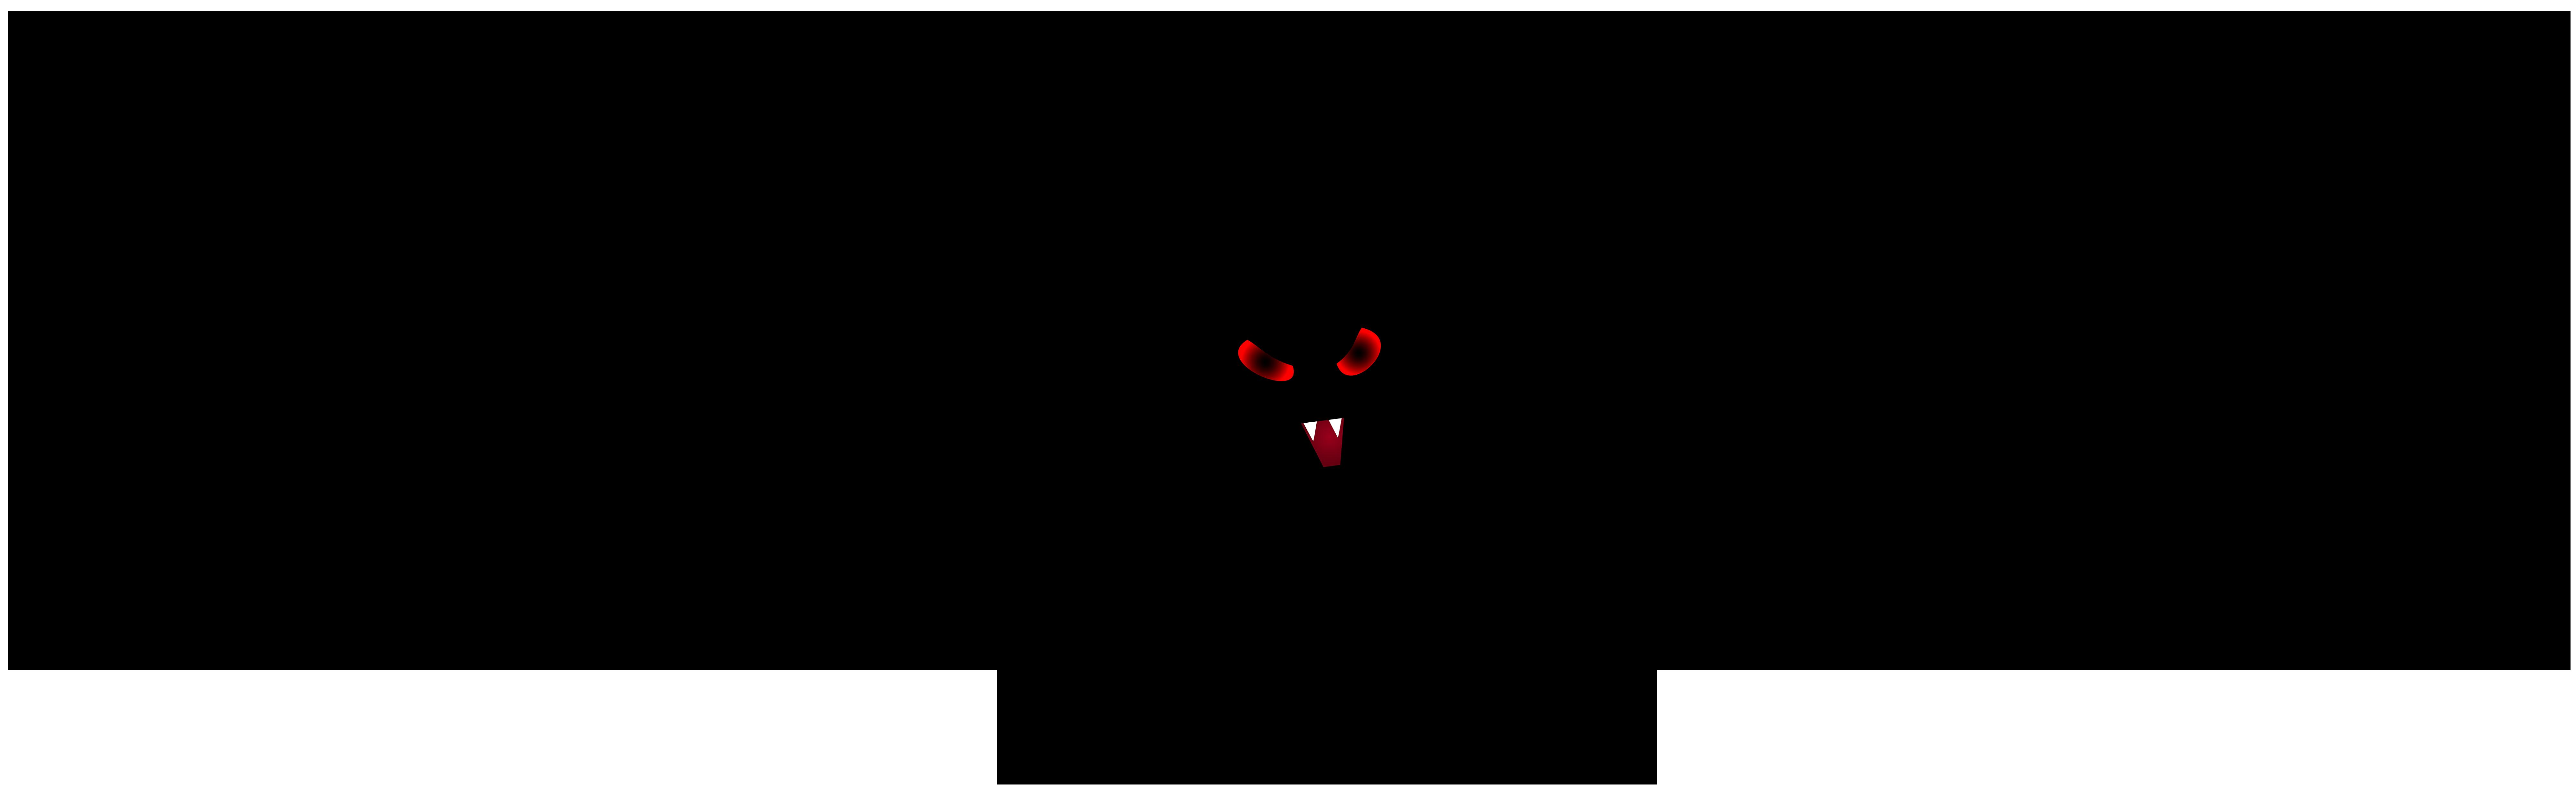 Halloween Black Bat PNG Clip Art Image.